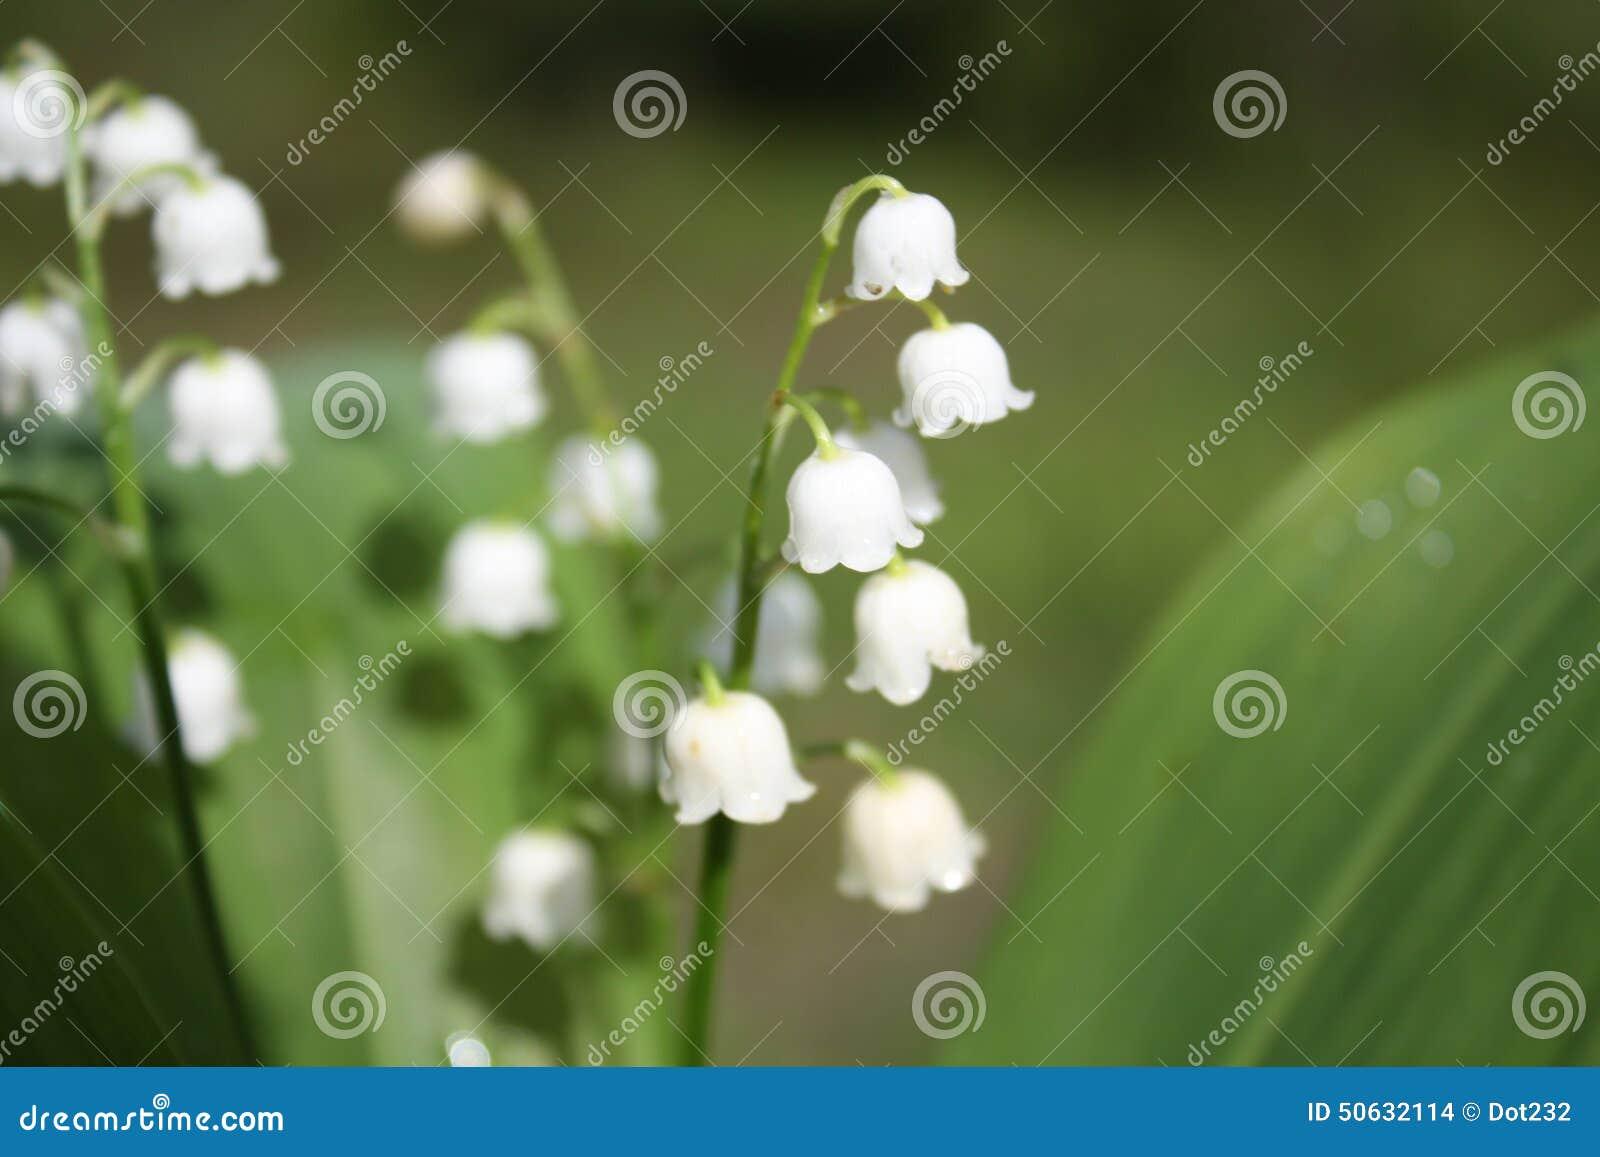 Campanelle Fiori.White Bell Flowers Stock Photo Image Of Season Fresh 50632114